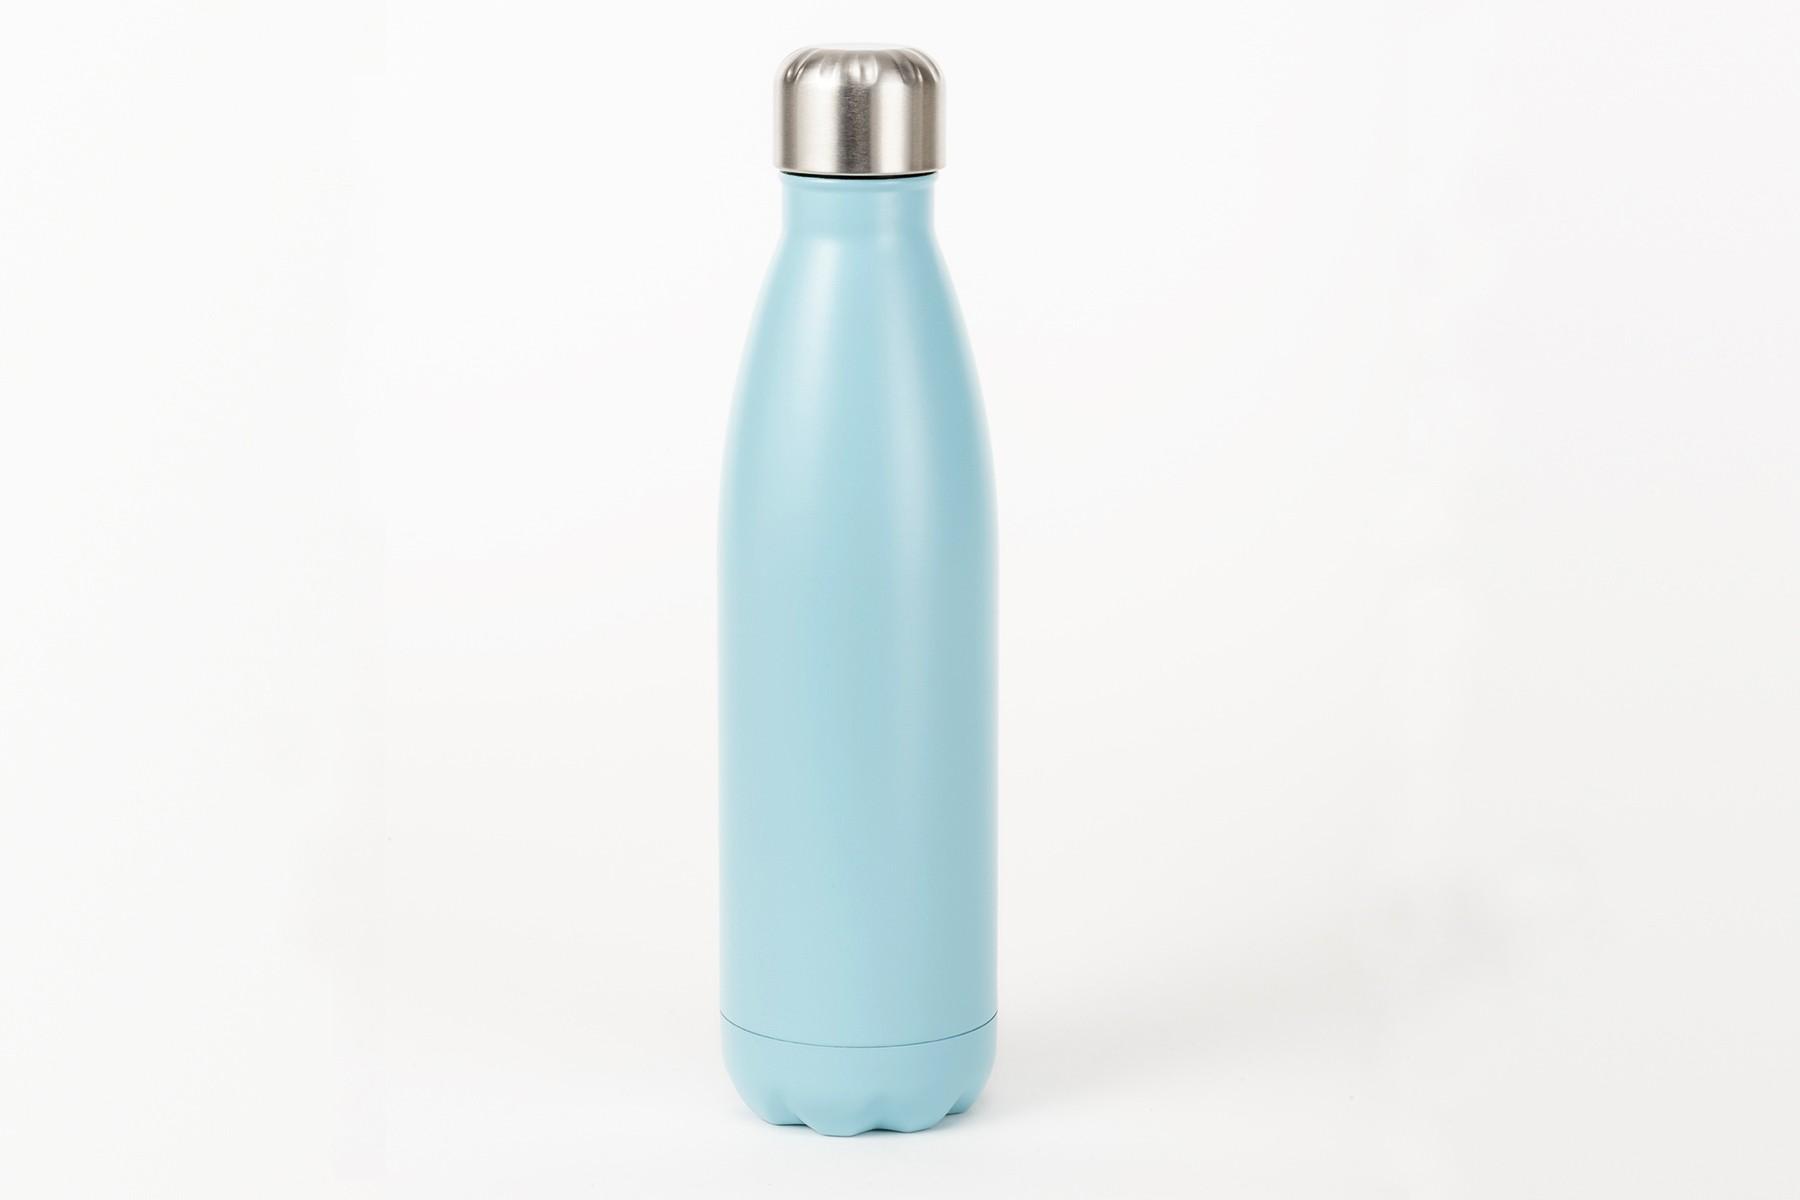 Butelka morska, 500 ml